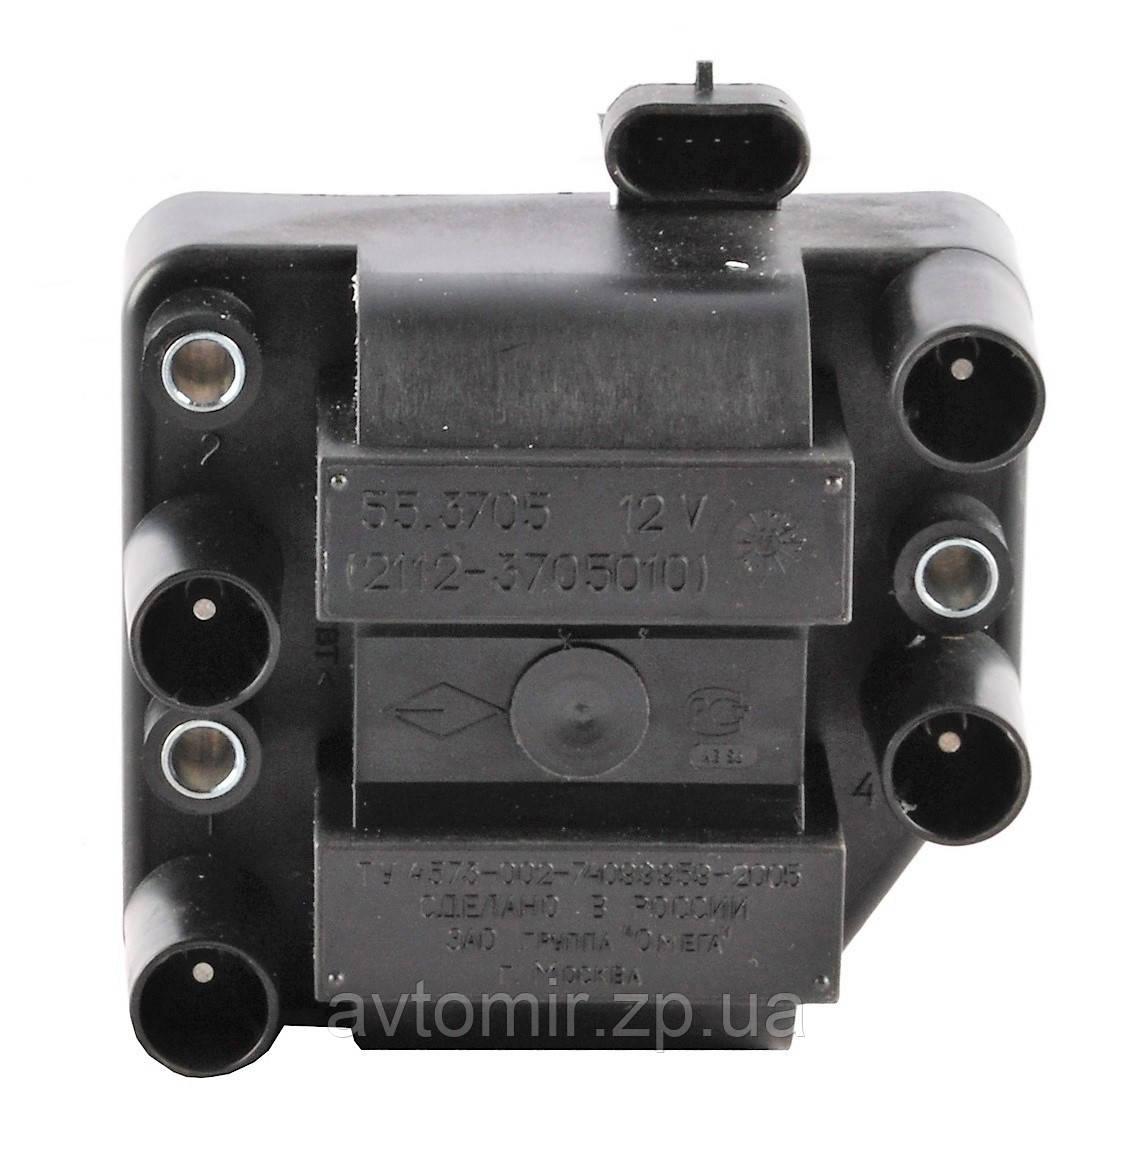 Катушка зажигания (модуль) ВАЗ 2110-2112,2113-2115 55.3705